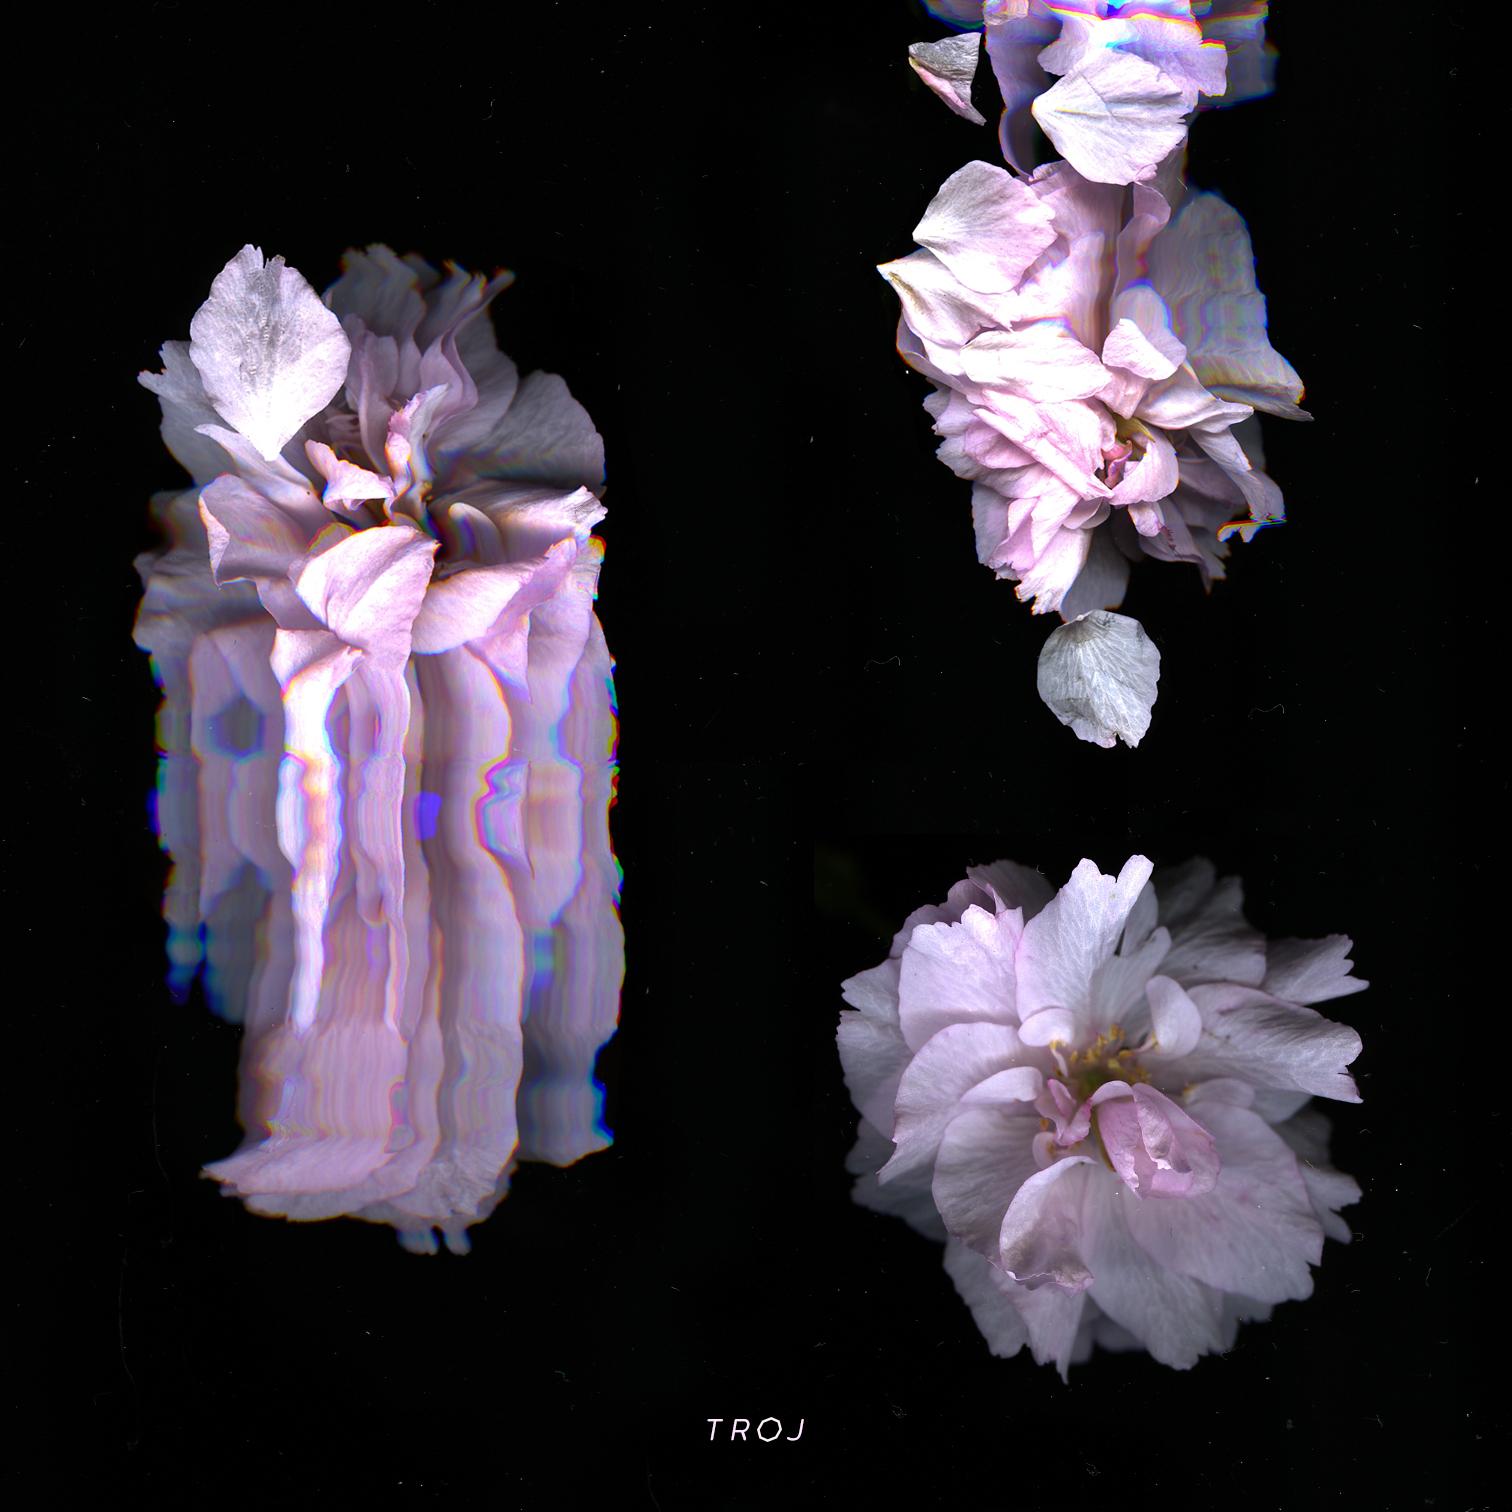 VA - TROJ EP COVER ART